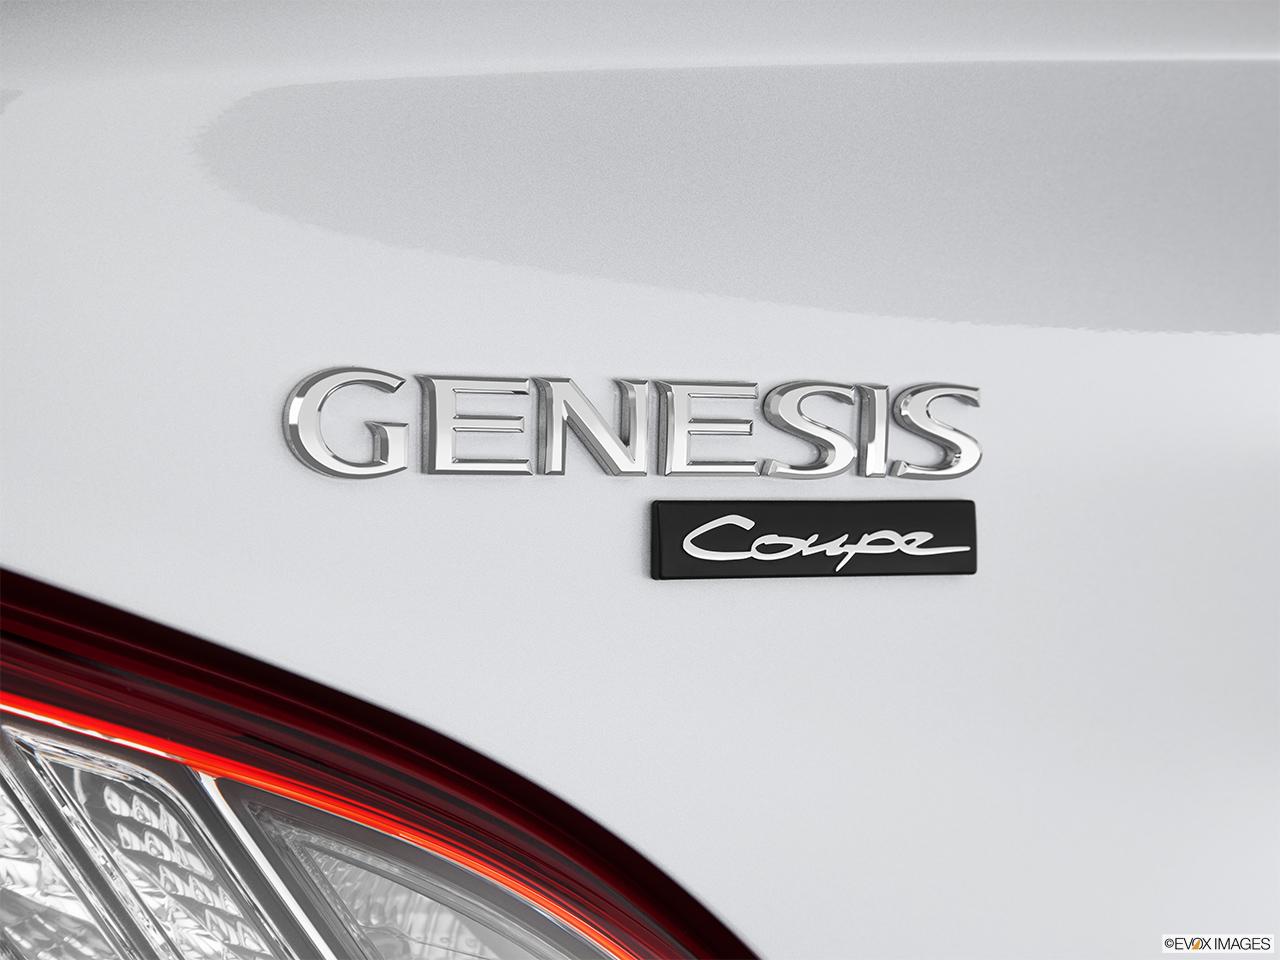 2015 Hyundai Genesis Coupe 2 Door 3 8l Manual R Spec